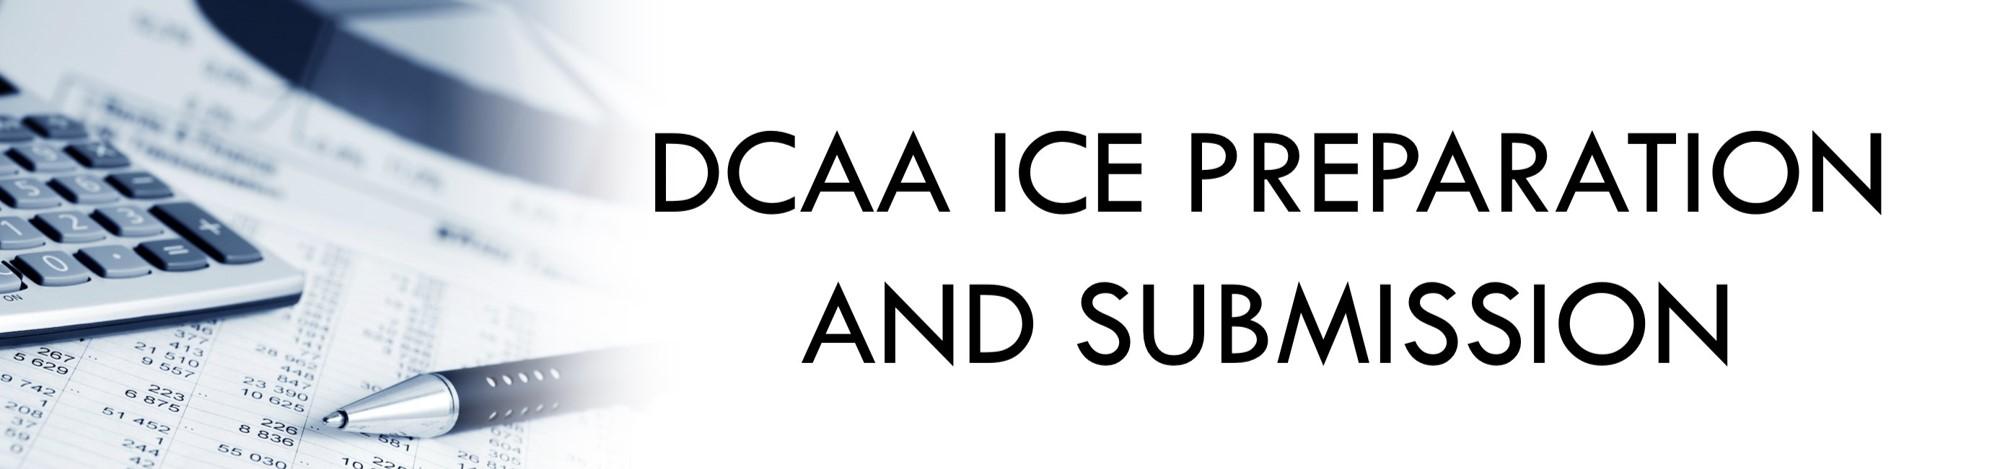 dcaa ice